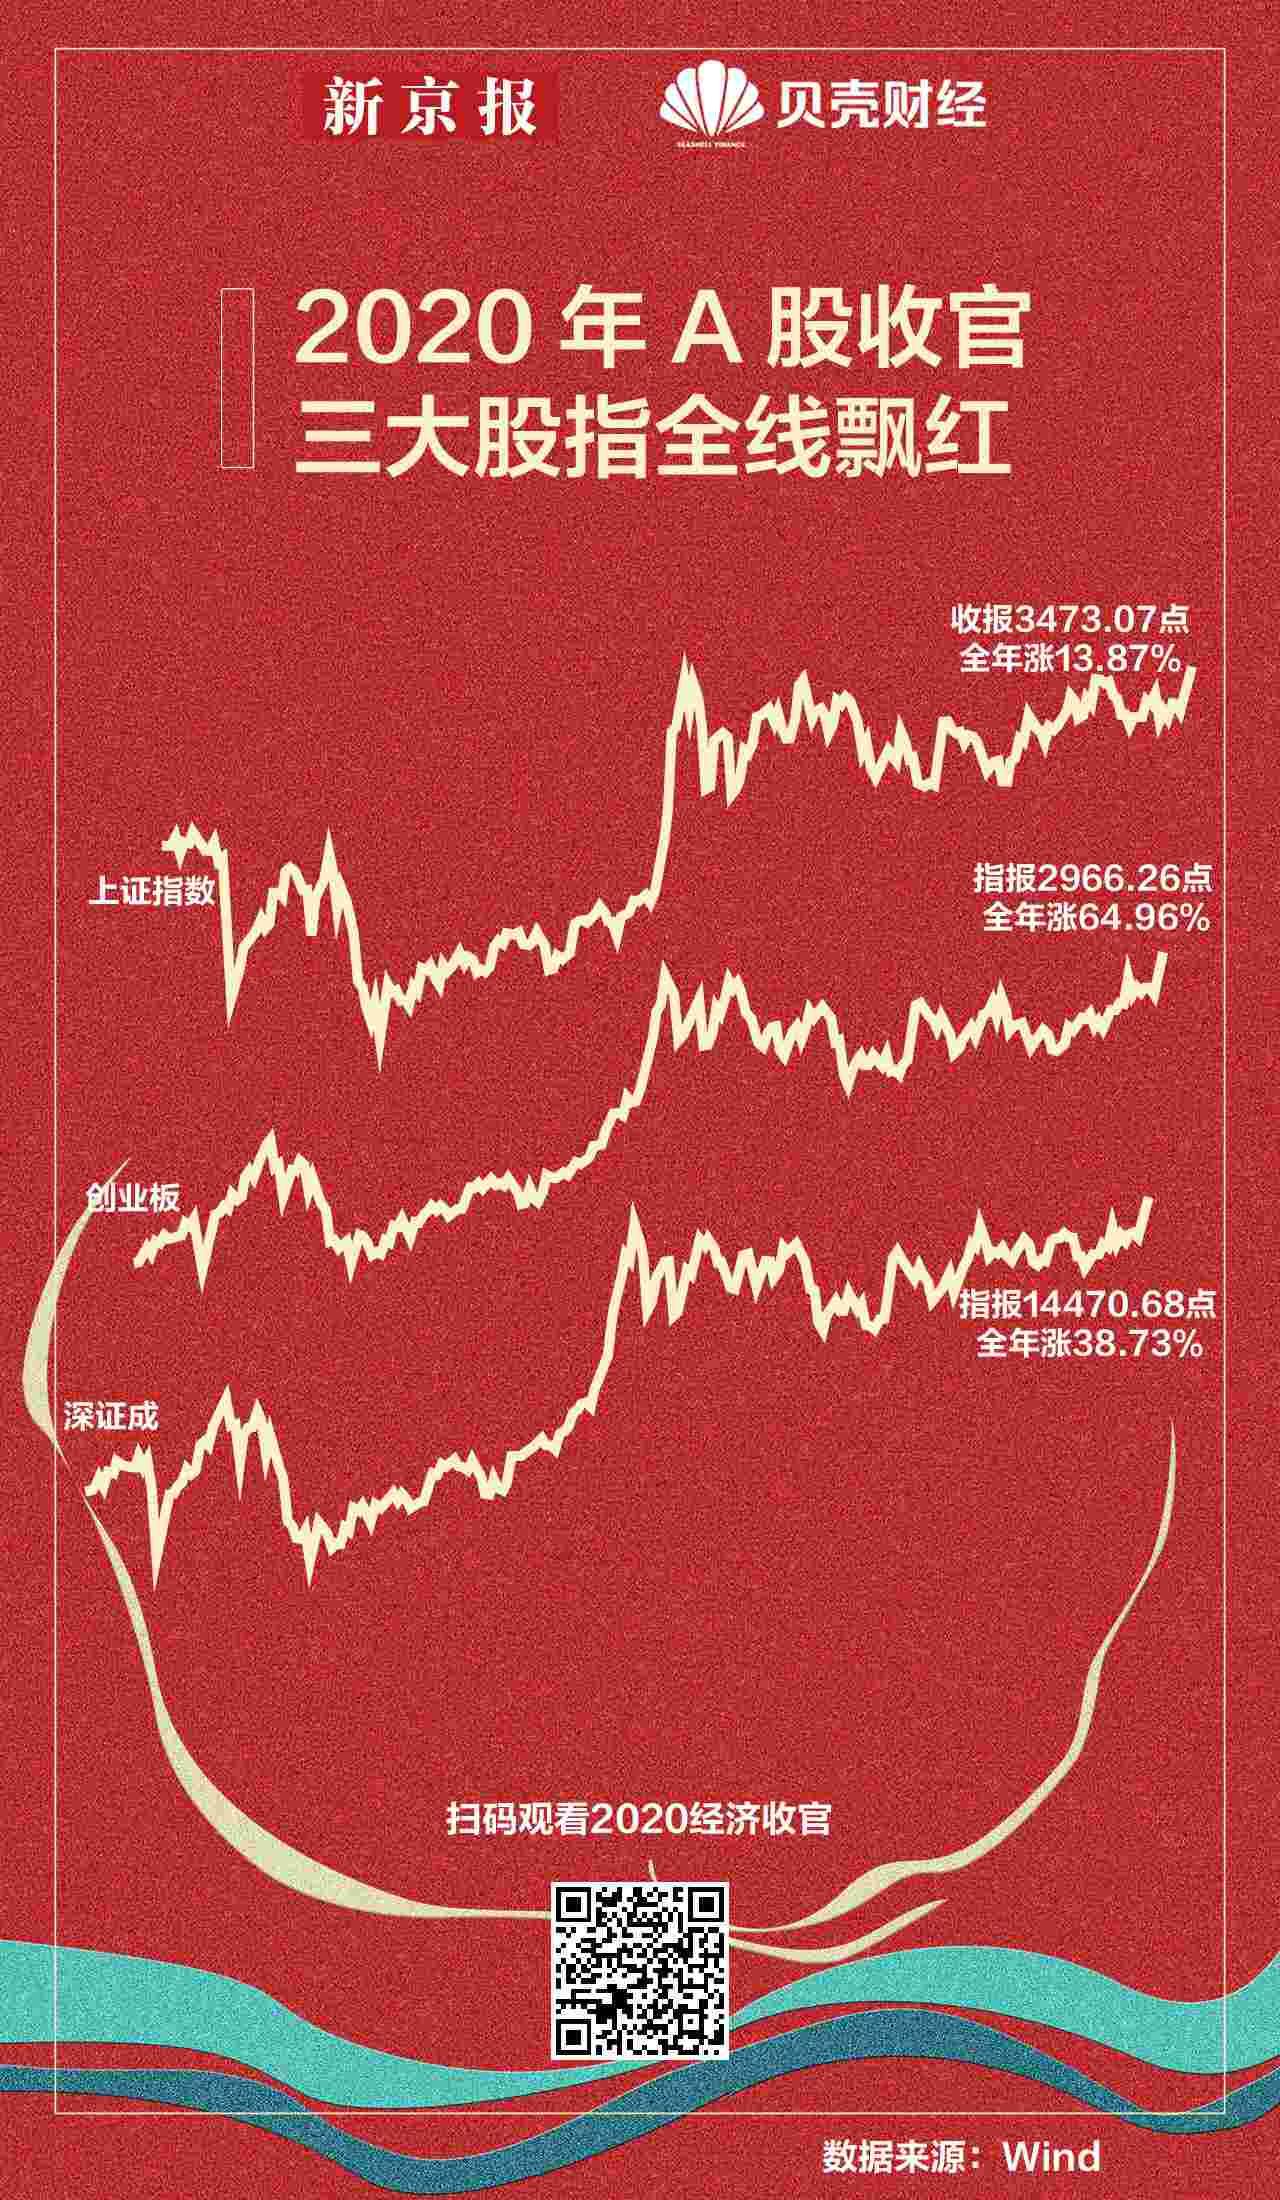 usdt不用实名(caibao.it):白酒跻身年度涨幅前三甲,A股飘红收官后2021年将若何演绎? 第1张